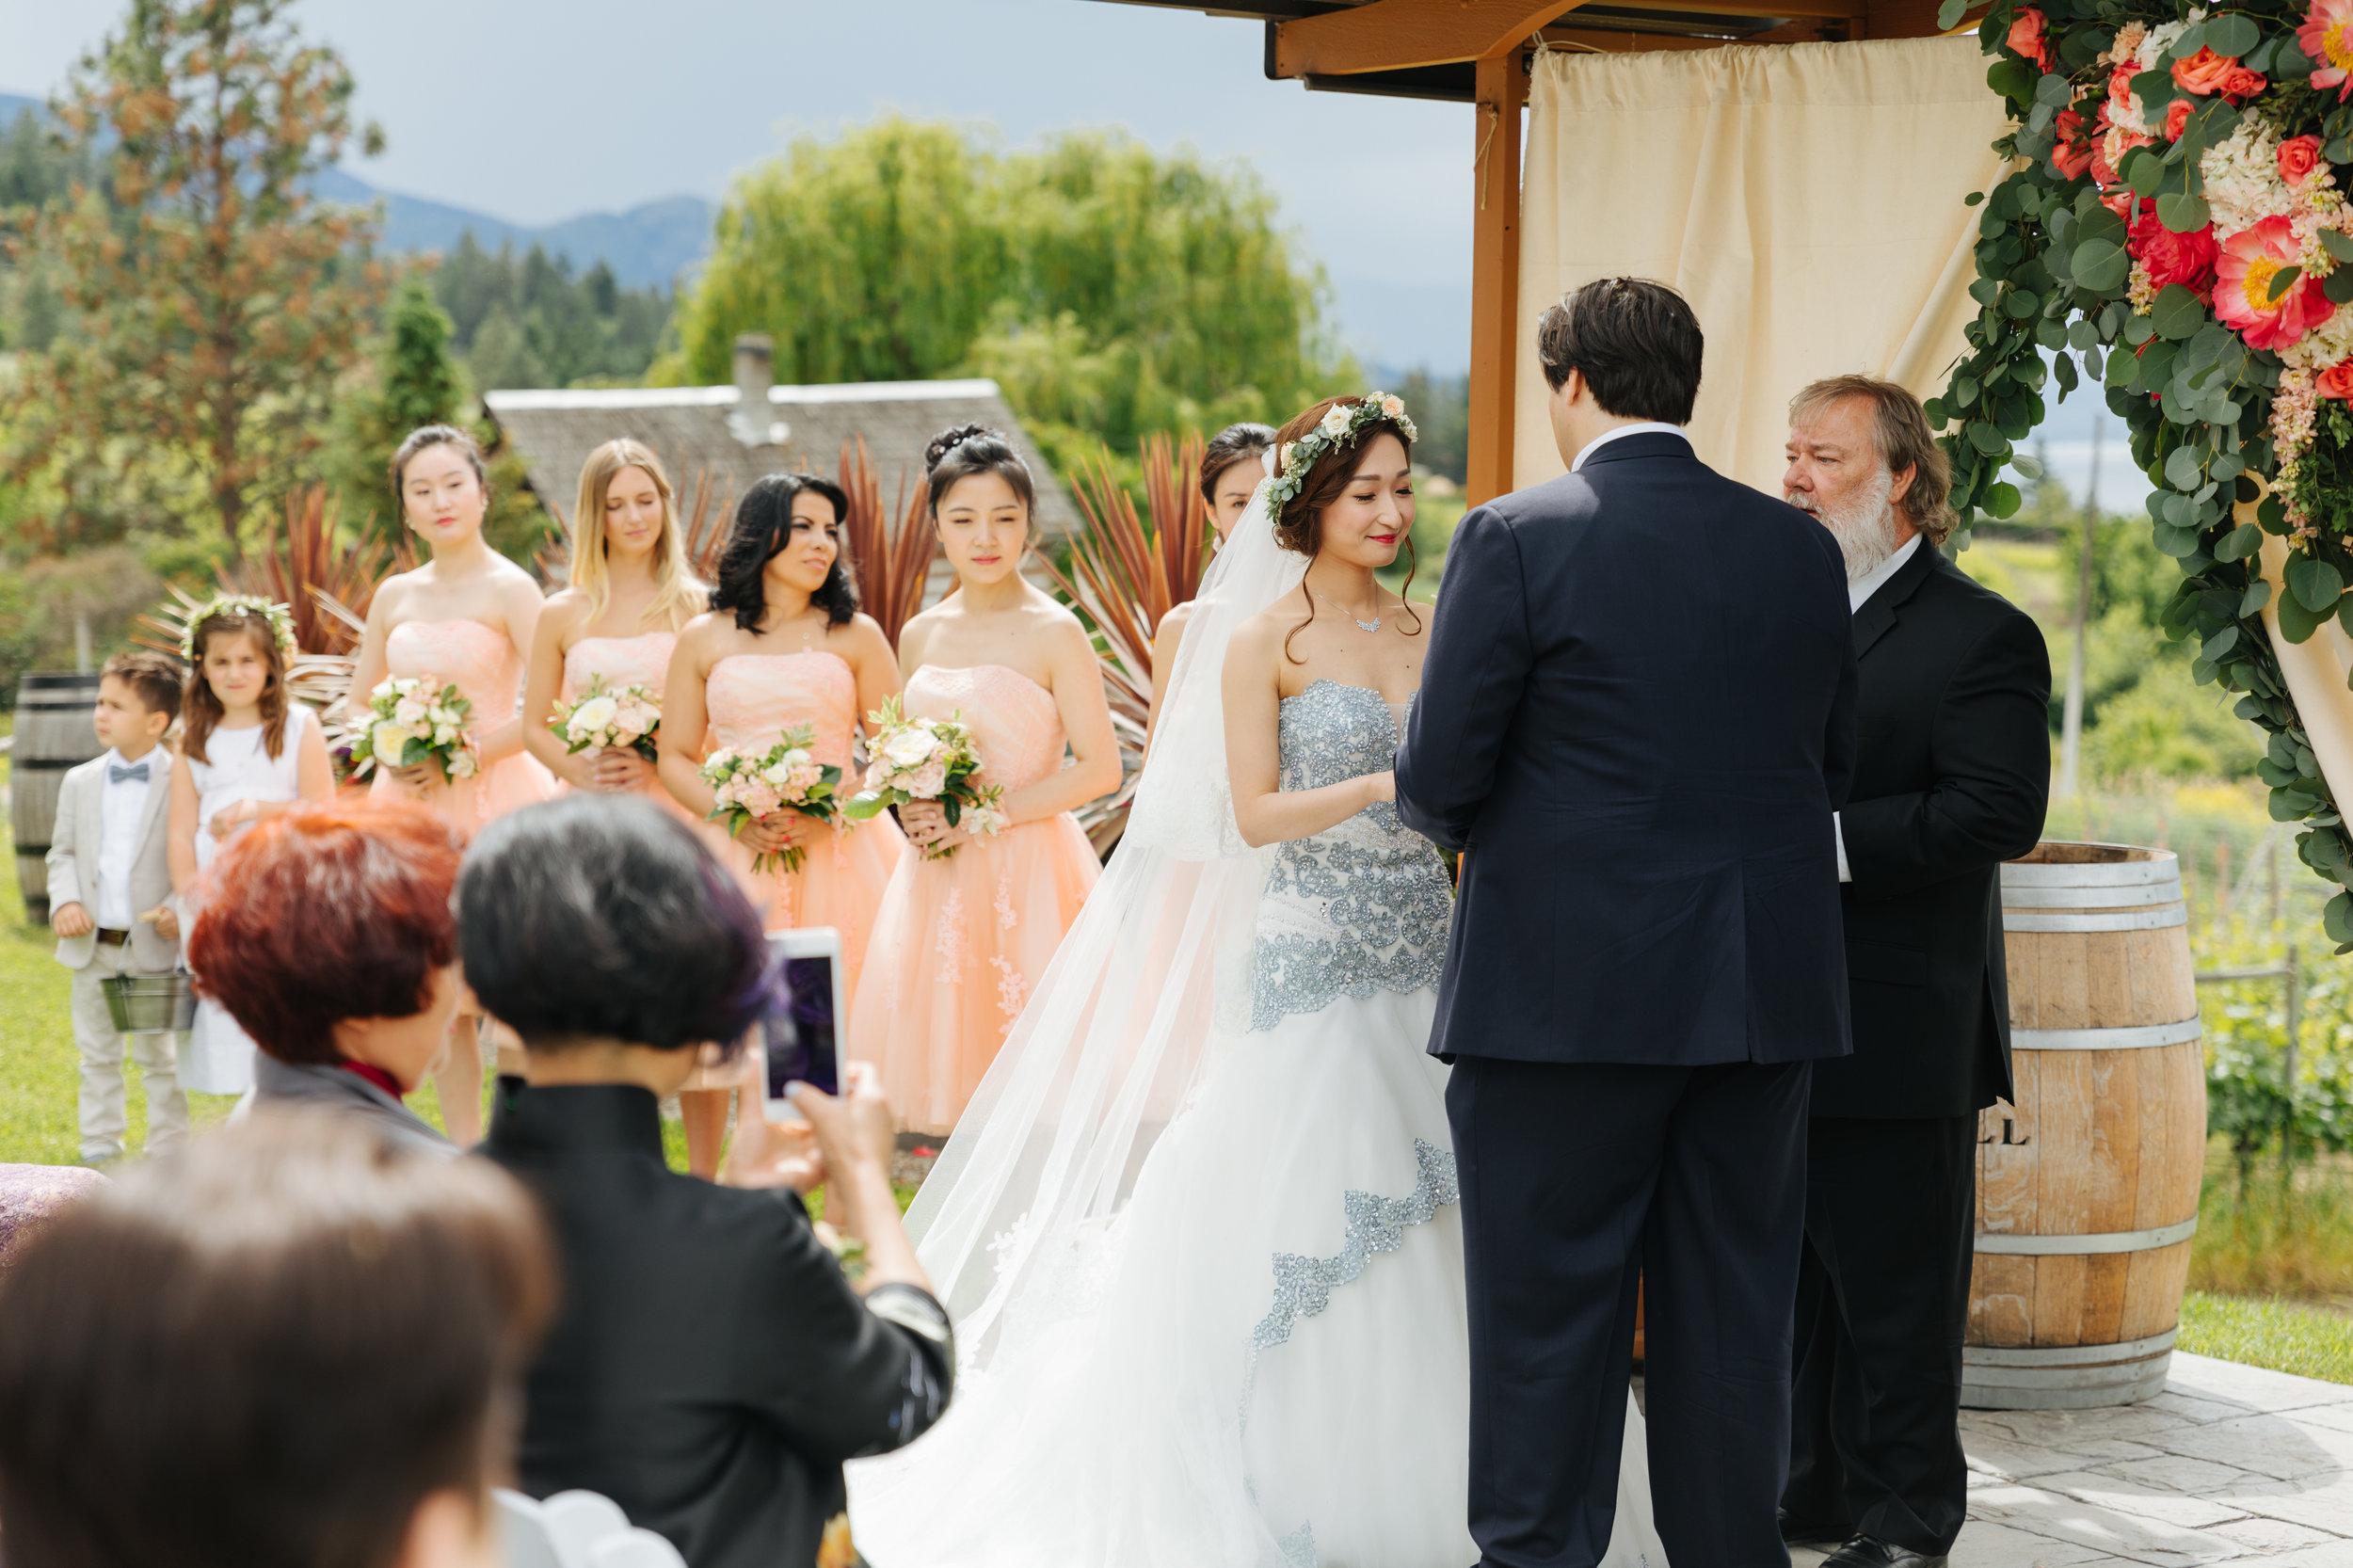 herastudios_wedding_jill_ivan_hera_selects-19.jpg